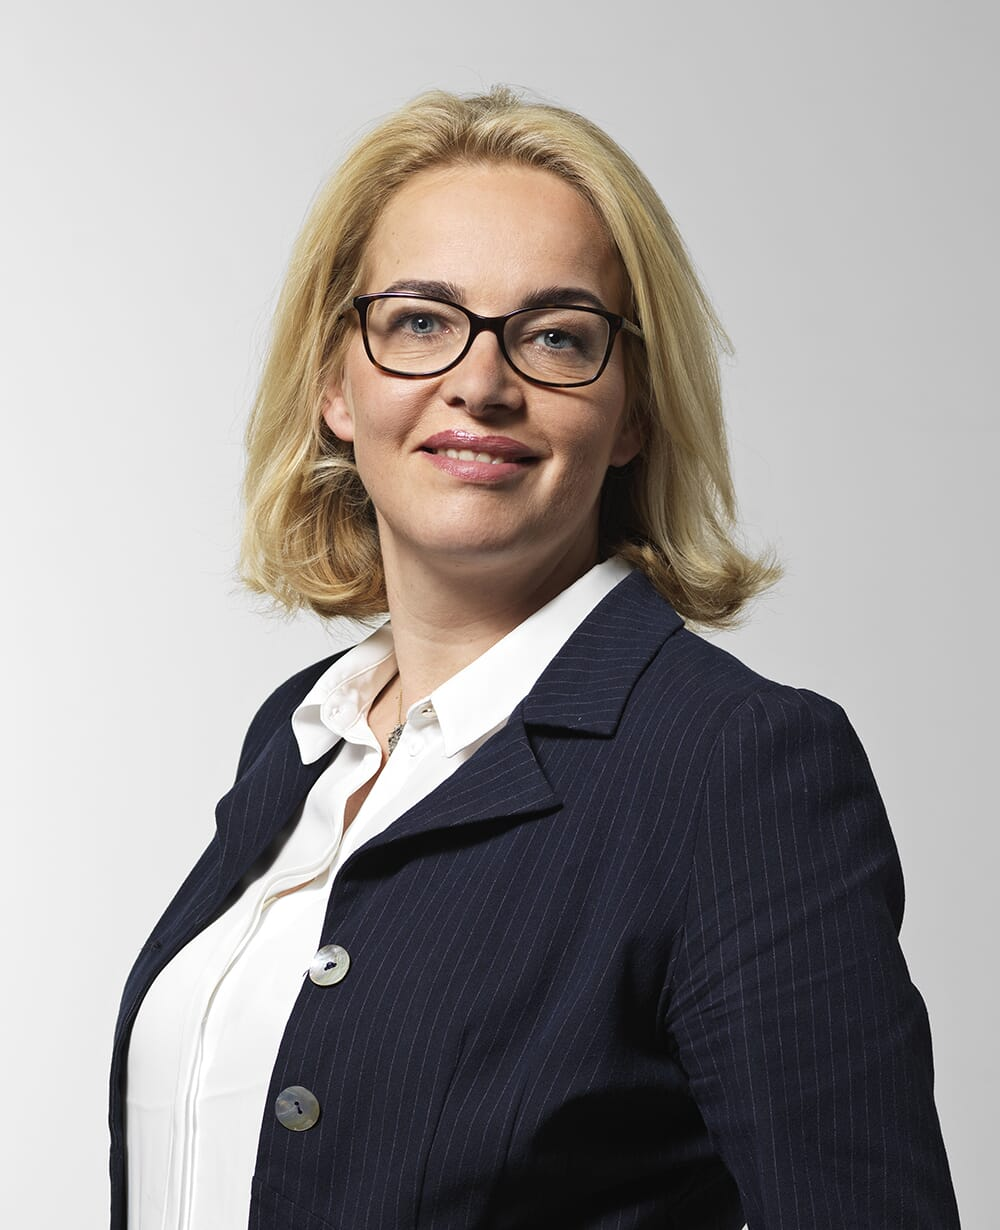 Catharina Piper